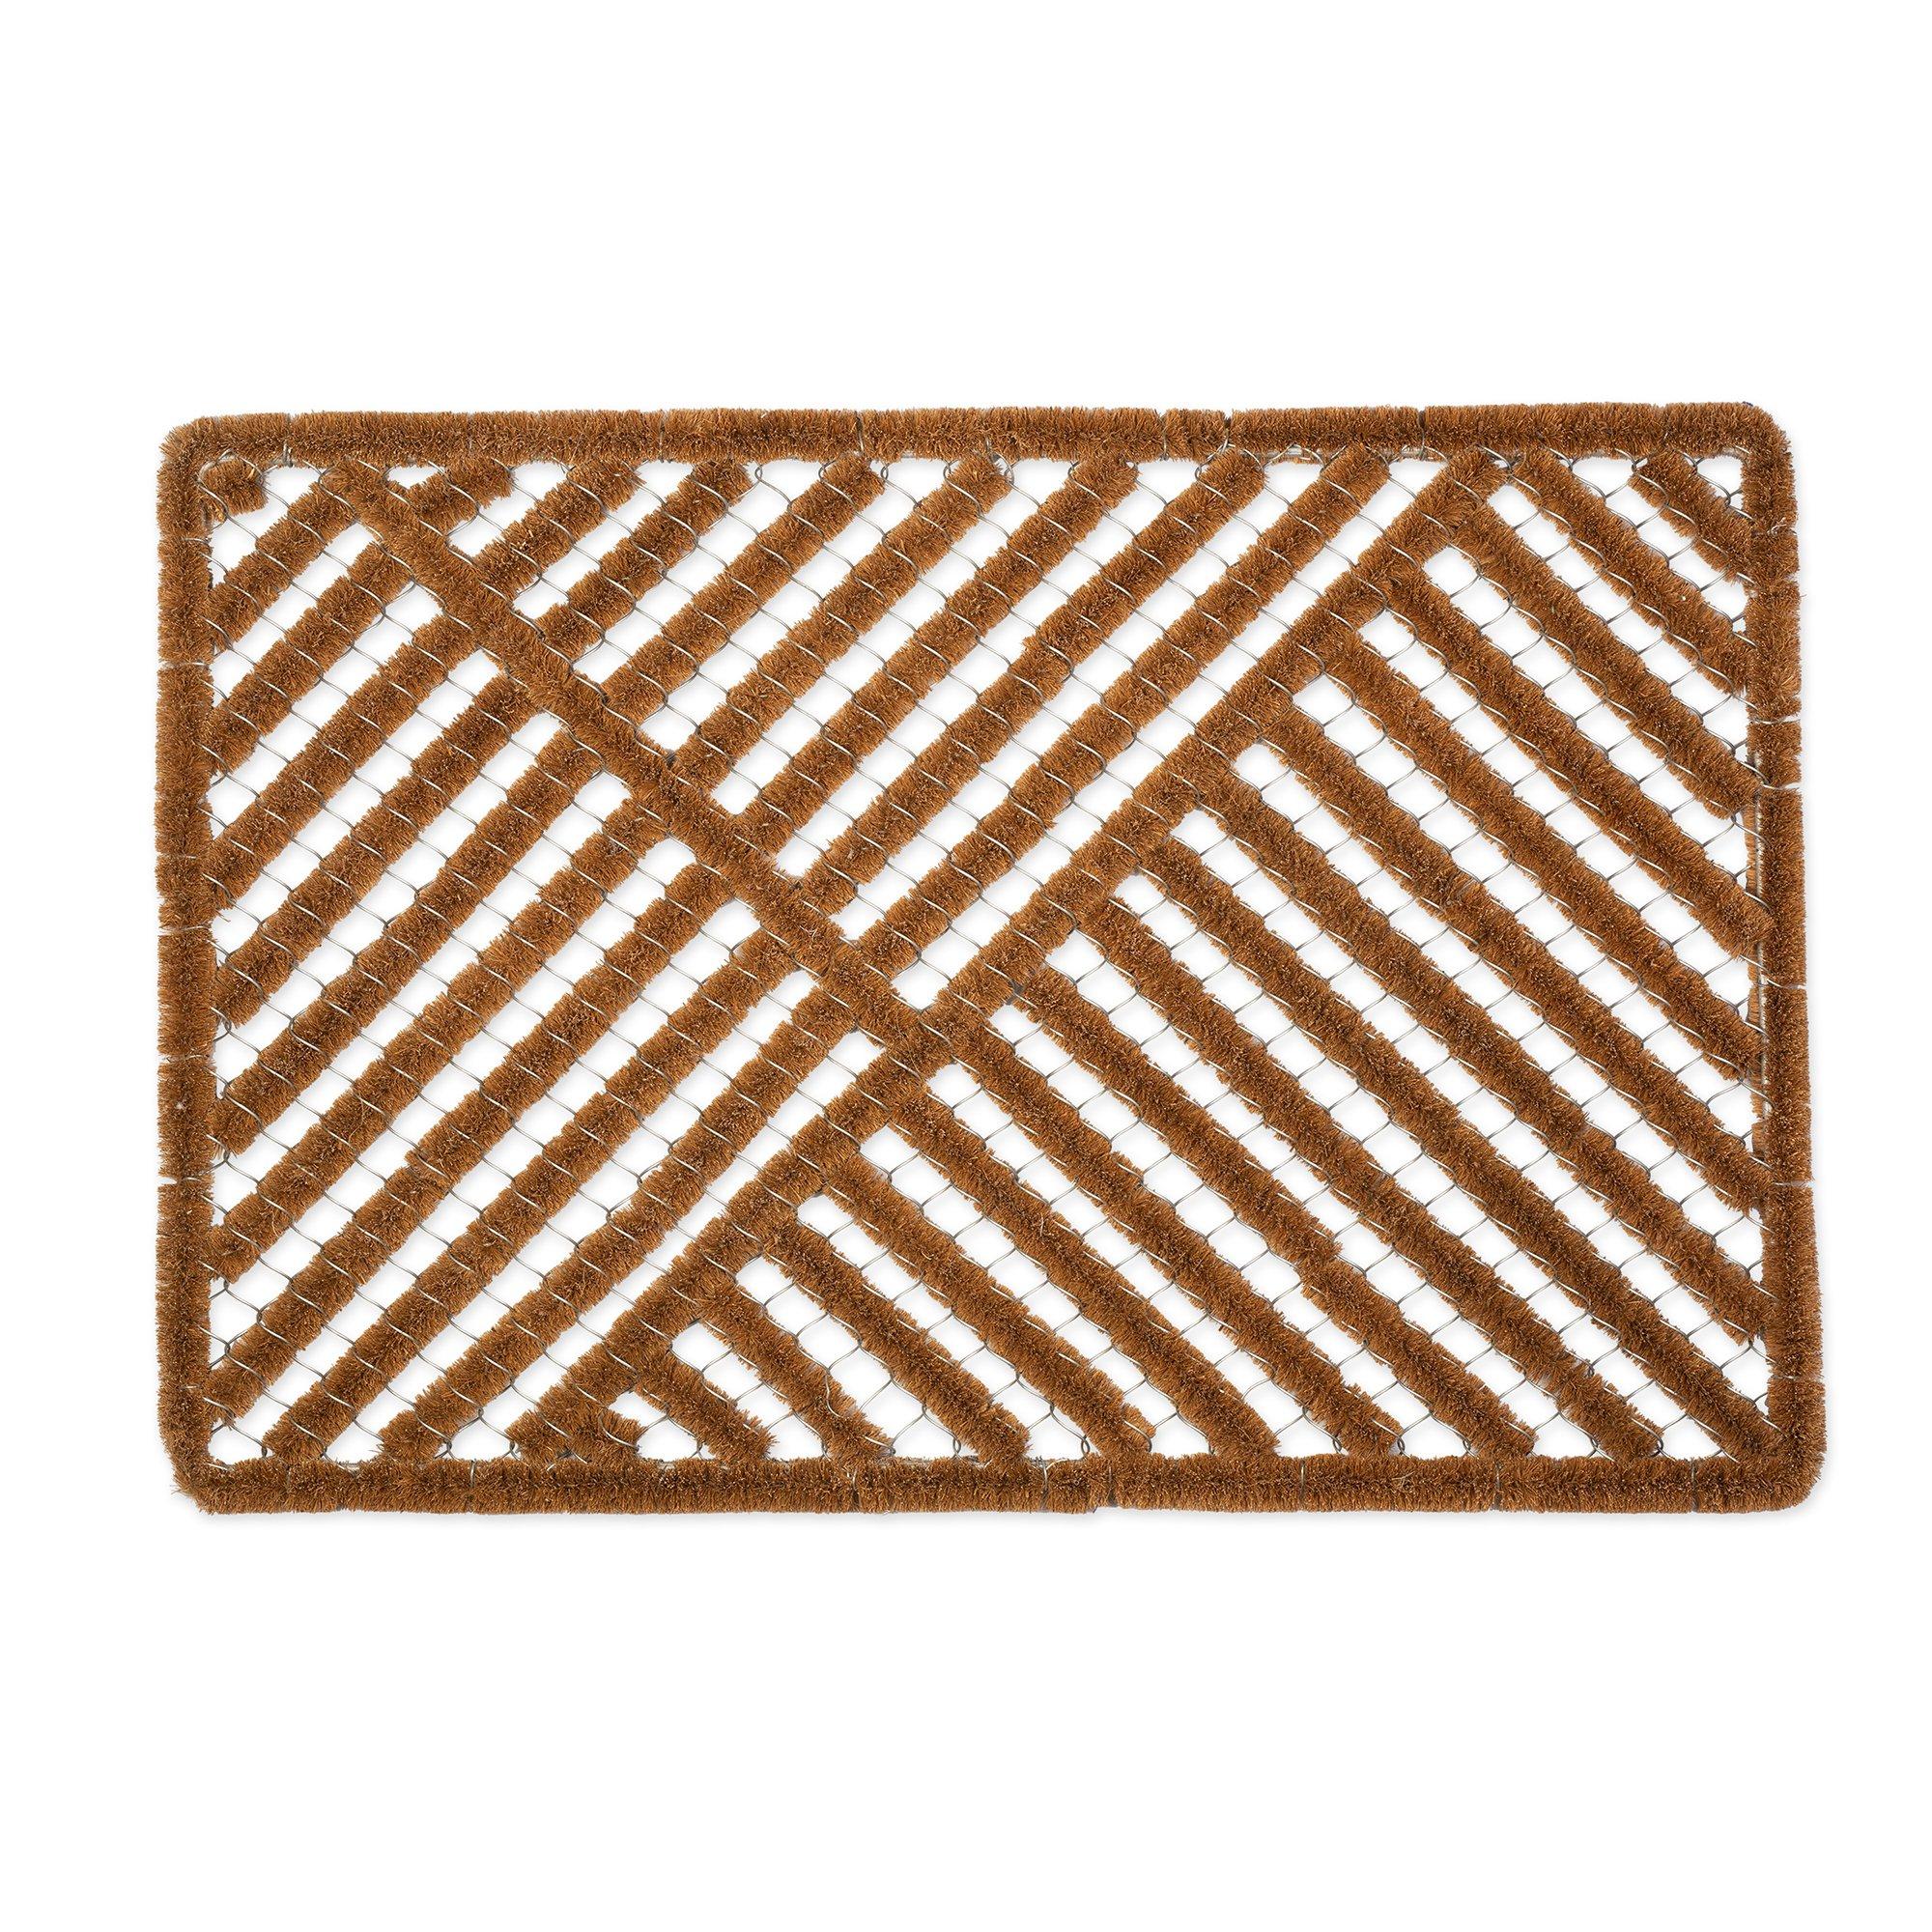 J&M Home Fashions Natural Coir Outdoor Boot Scraper Doormat, 24x36'', Heavy Duty Entry Way Shoes Scraper Patio Rug Dirt Debris Mud Trapper Waterproof